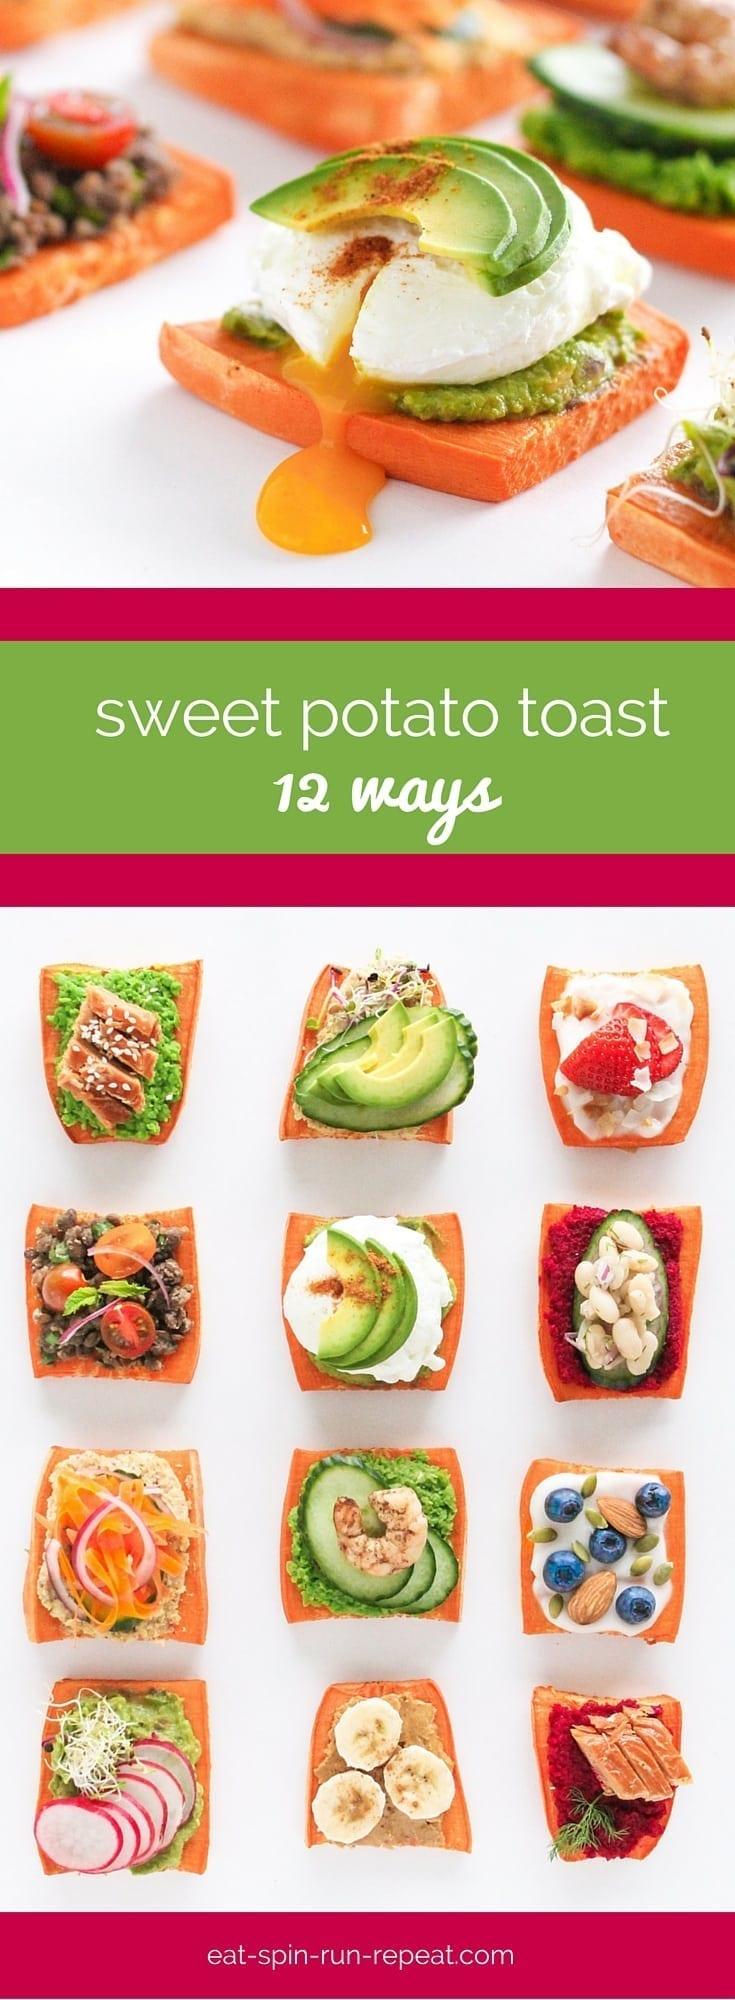 Trending Now - Sweet Potato Toast - Eat Spin Run Repeat